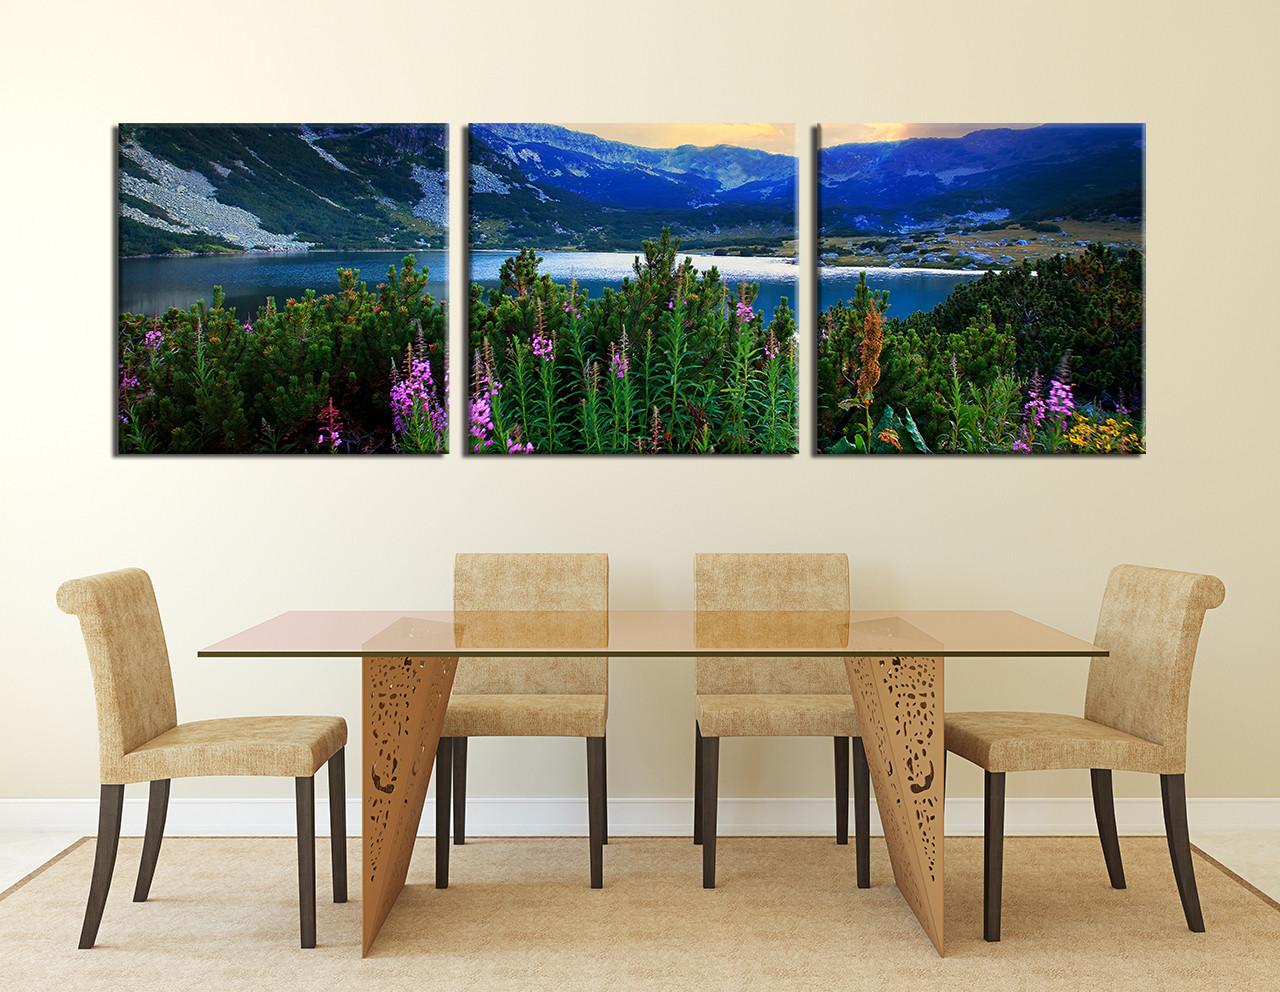 Dining Room Art, 3 Piece Canvas Art Prints, Blue Mountain Wall Art,  Landscape Part 37